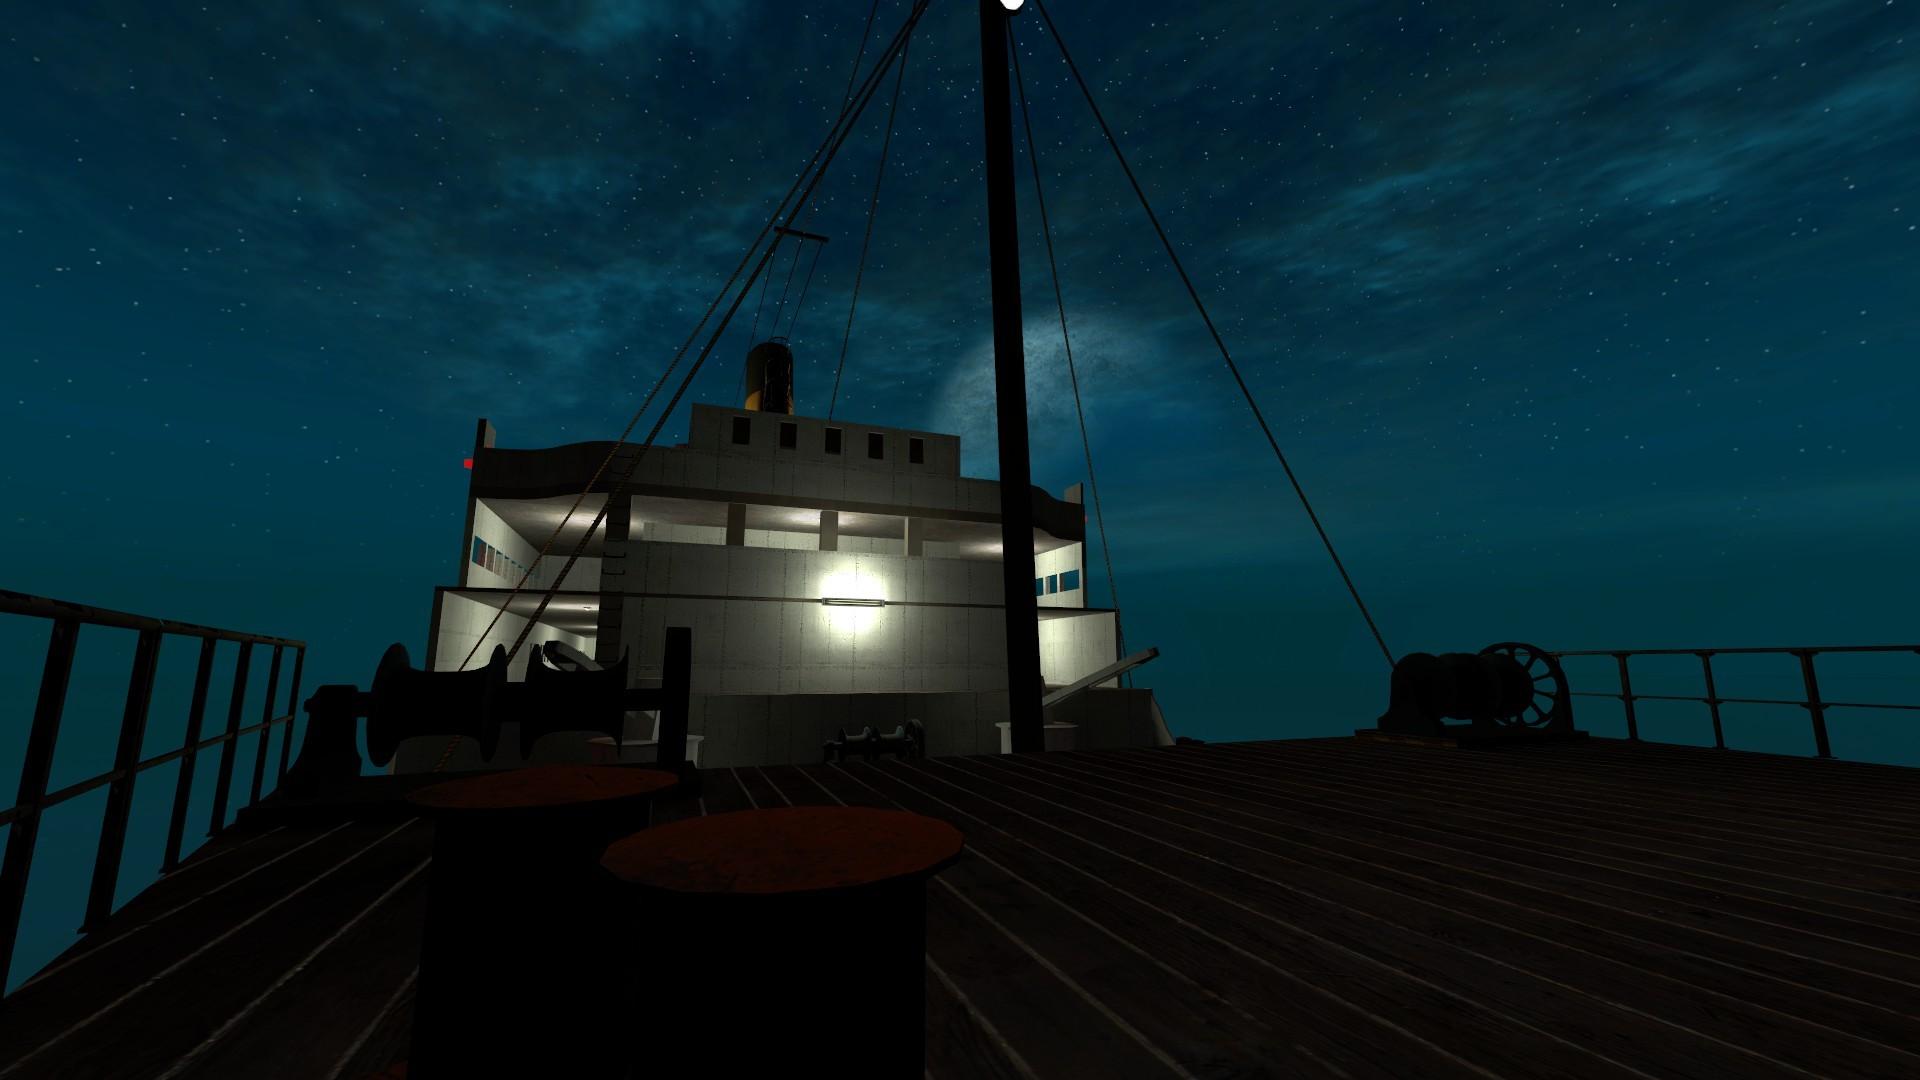 de_Titanic 4f3eabc61191f